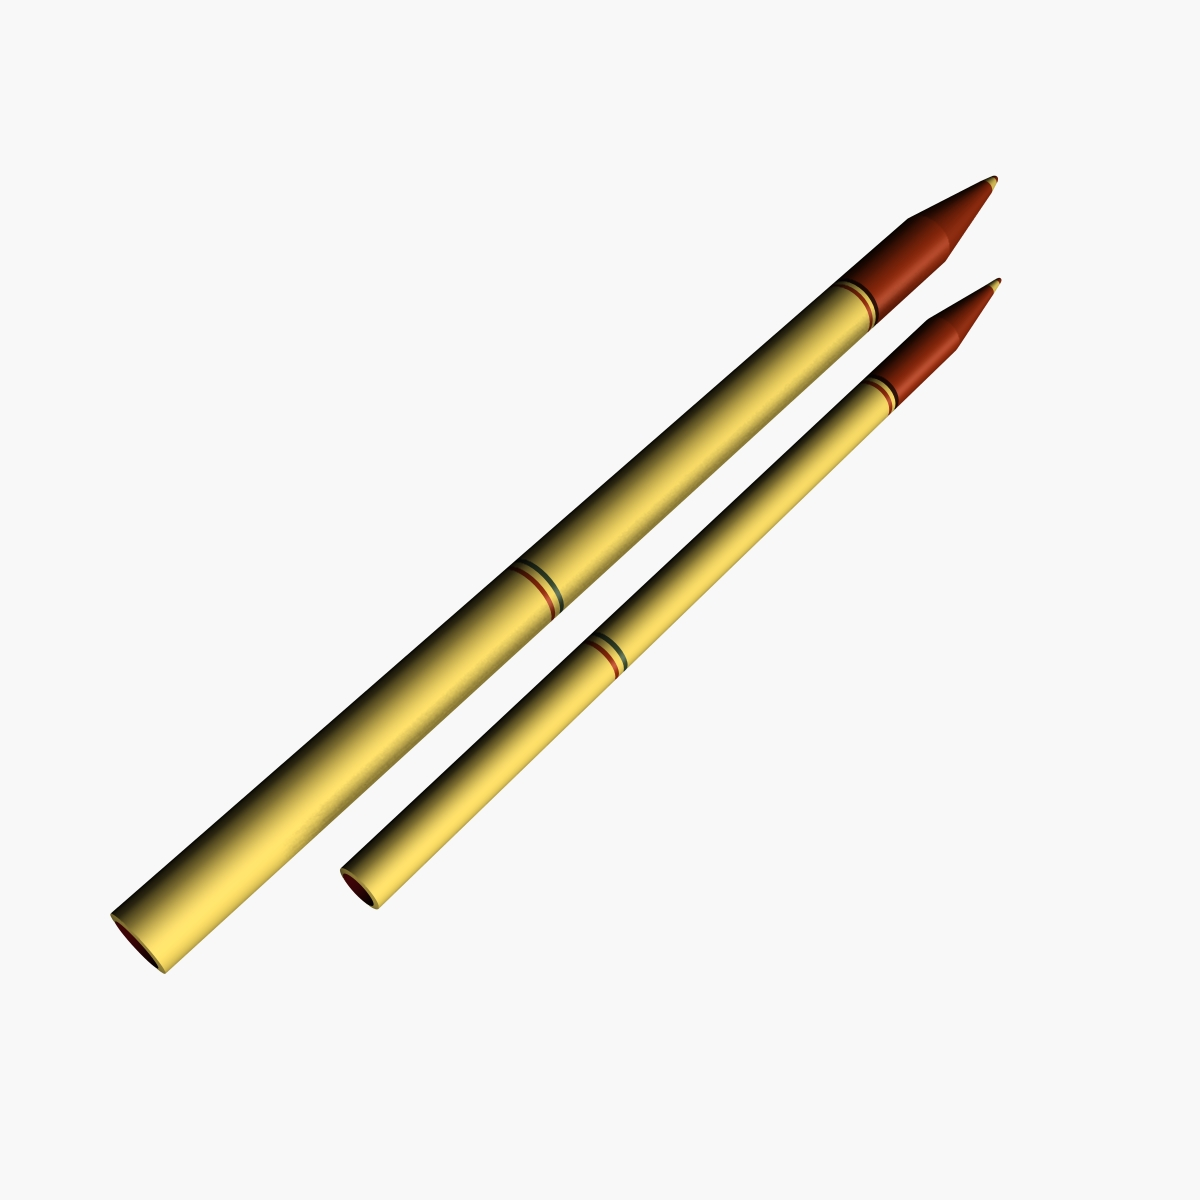 fadjr-3 & fadjr-5 rocket 3d model 3ds dxf fbx blend cob dae x  obj 205482